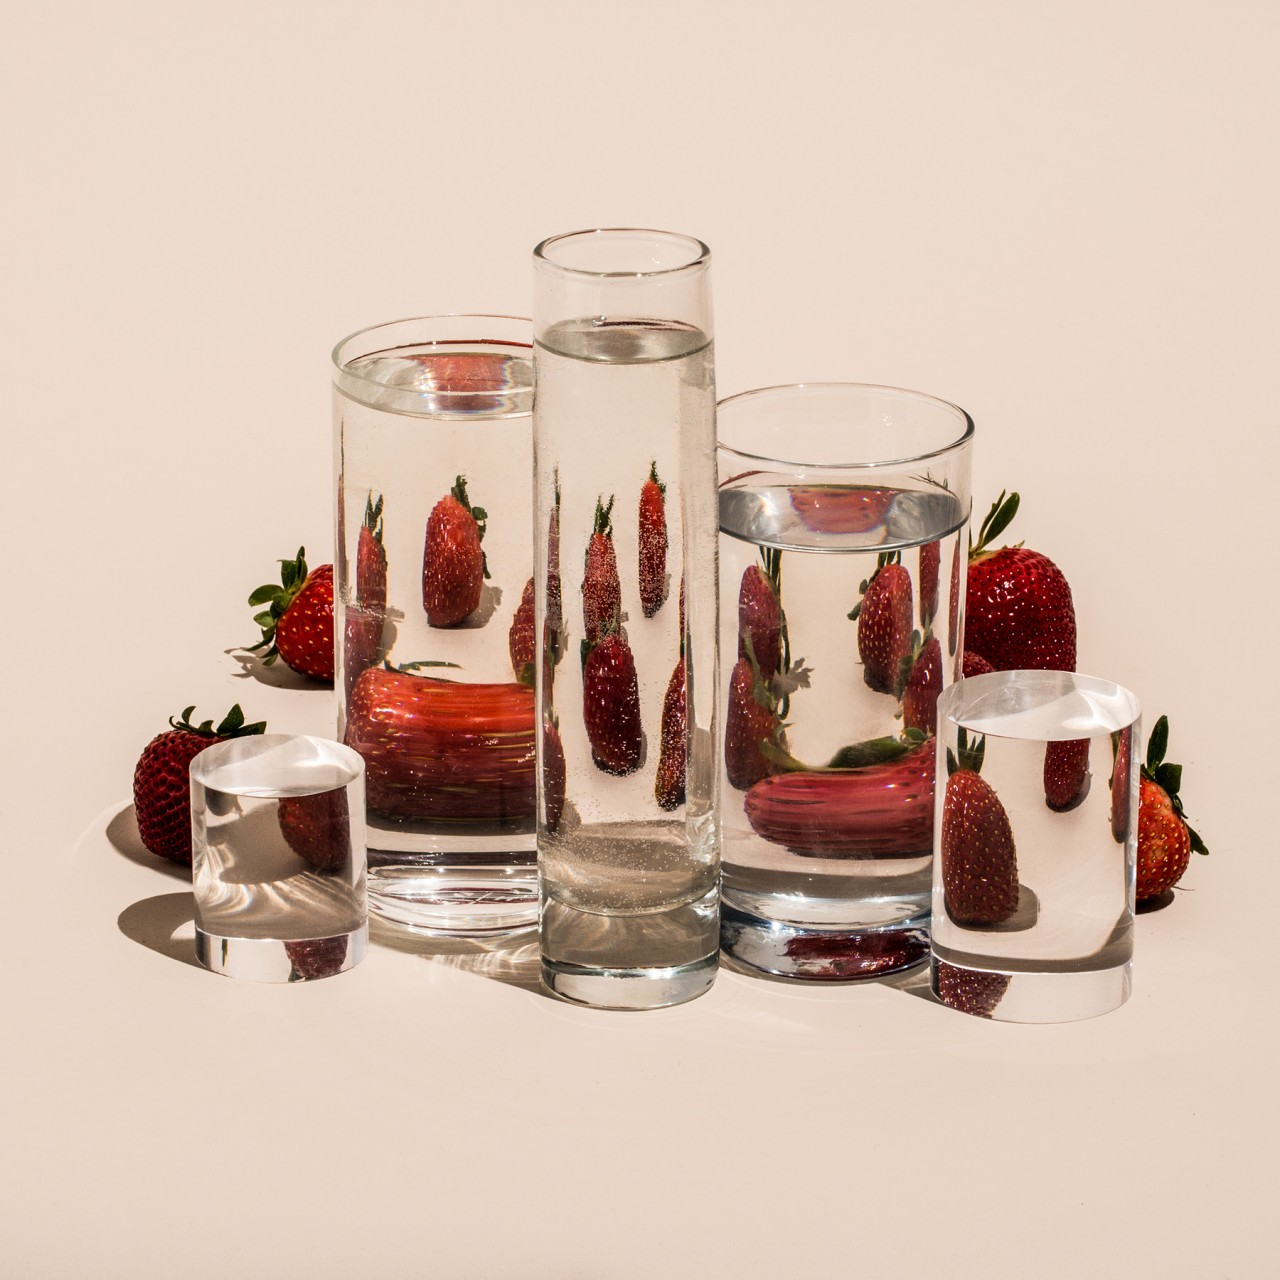 Strawberries.SuzanneSaroff.9969-640x640@2x